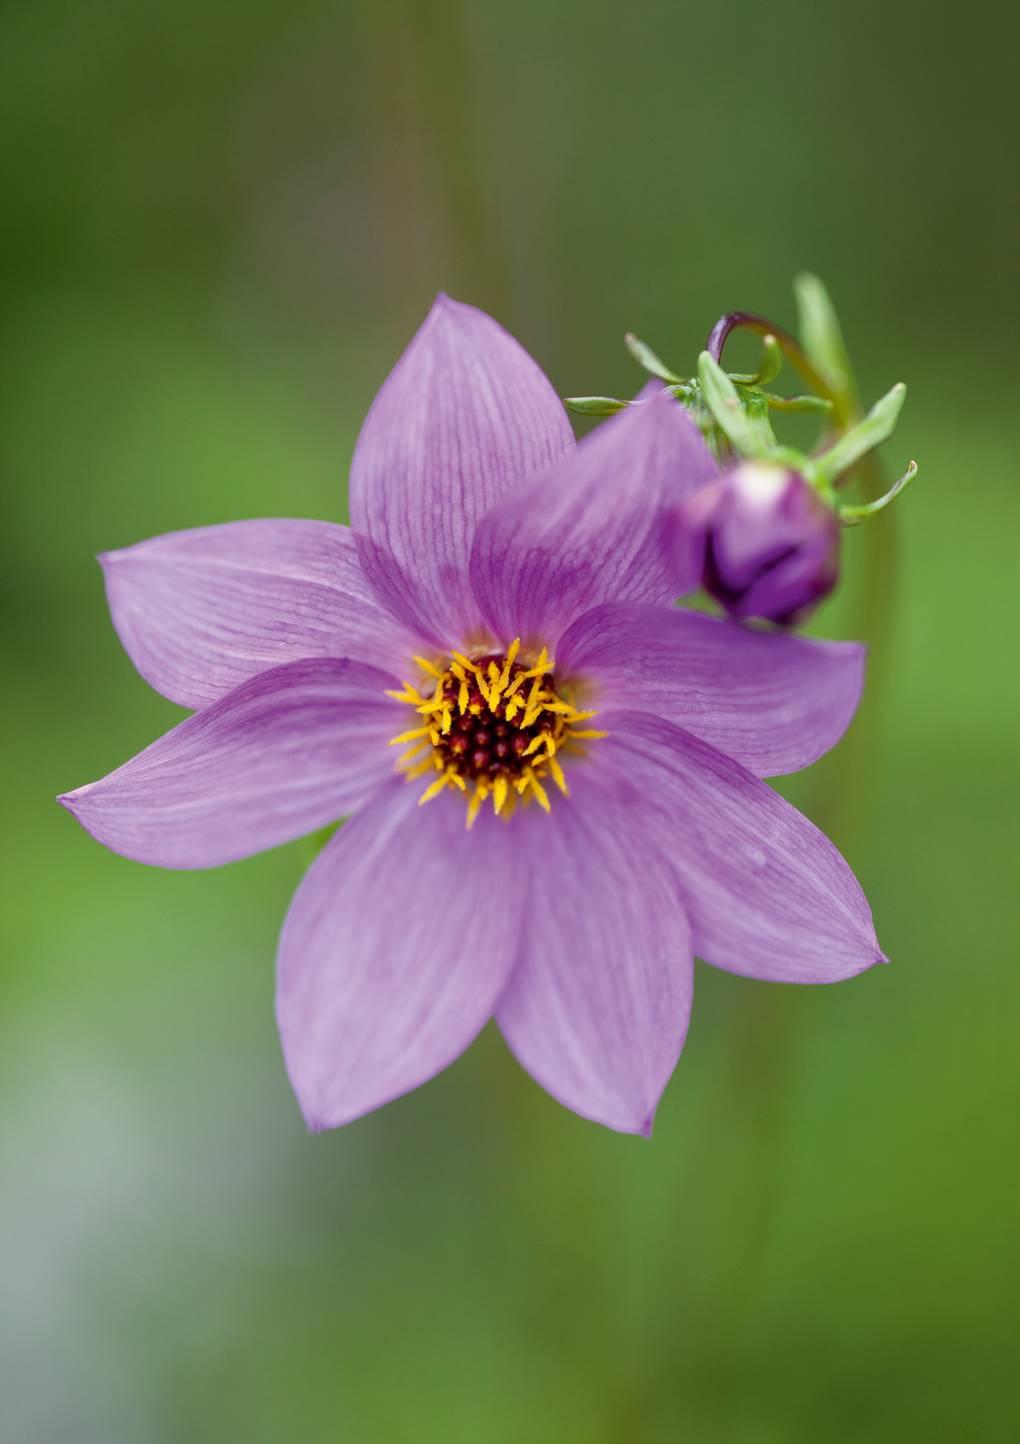 Best Perennials To Grow From Seed House Garden